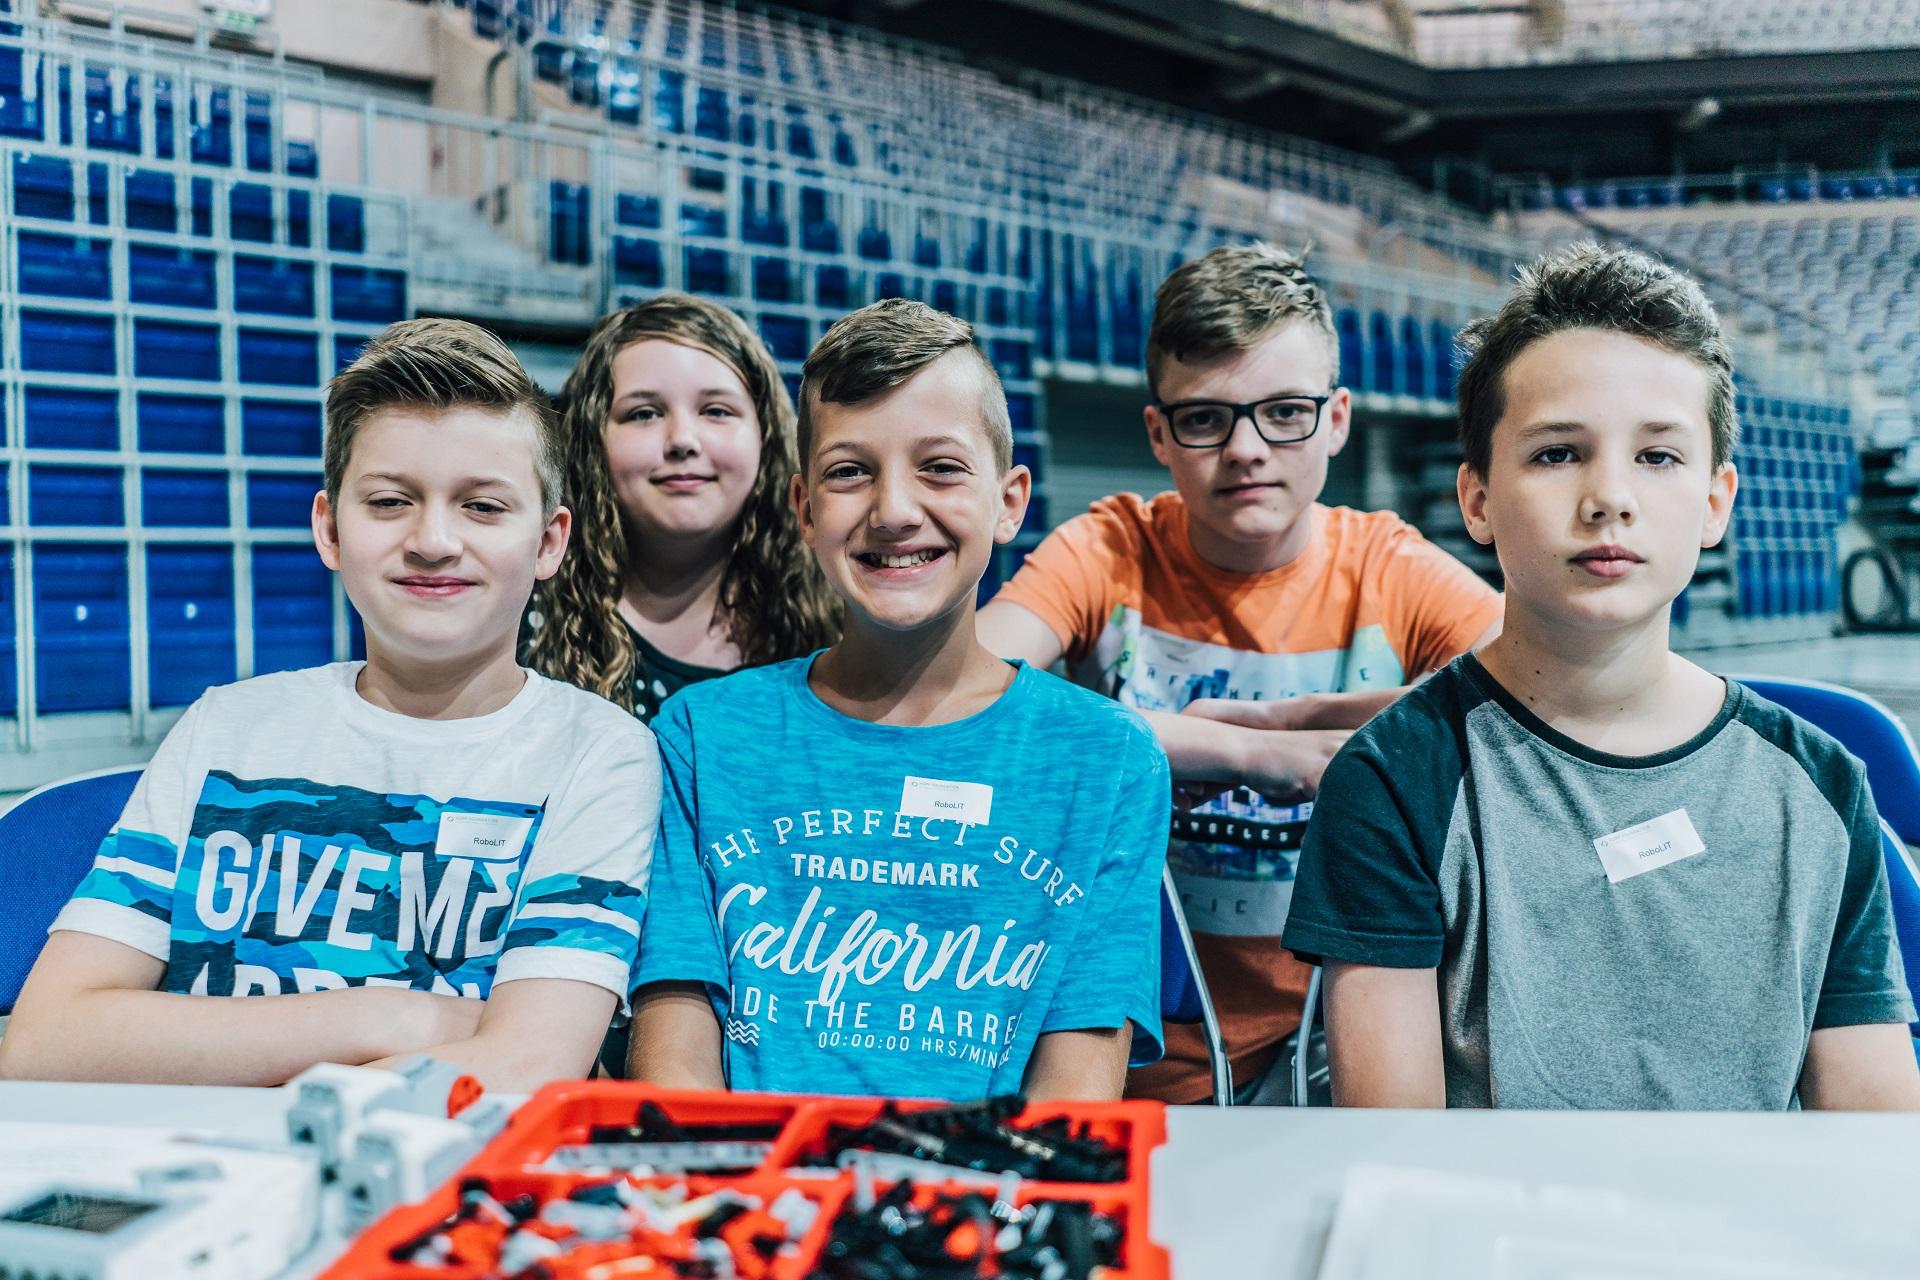 Mūsų gimnazistų debiutas Hopp fondo organizuotame LEGO-Mindstorms robotikos konkurse